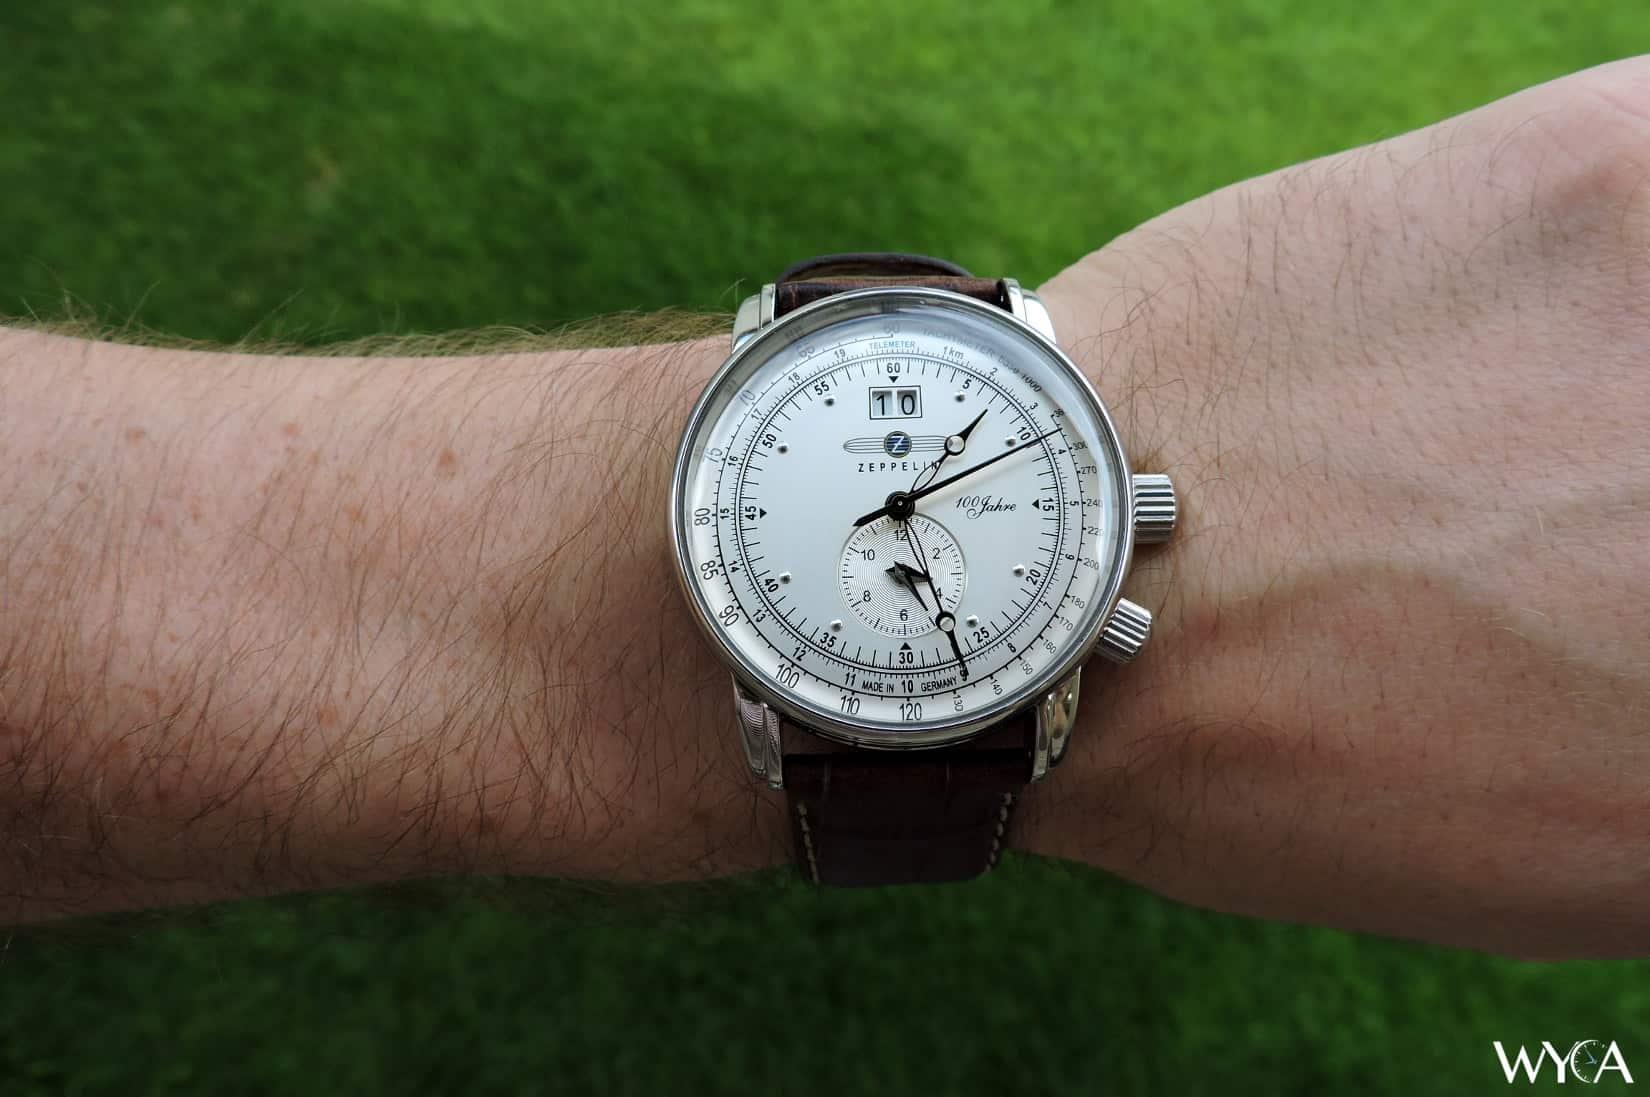 transatlantic watch | eBay